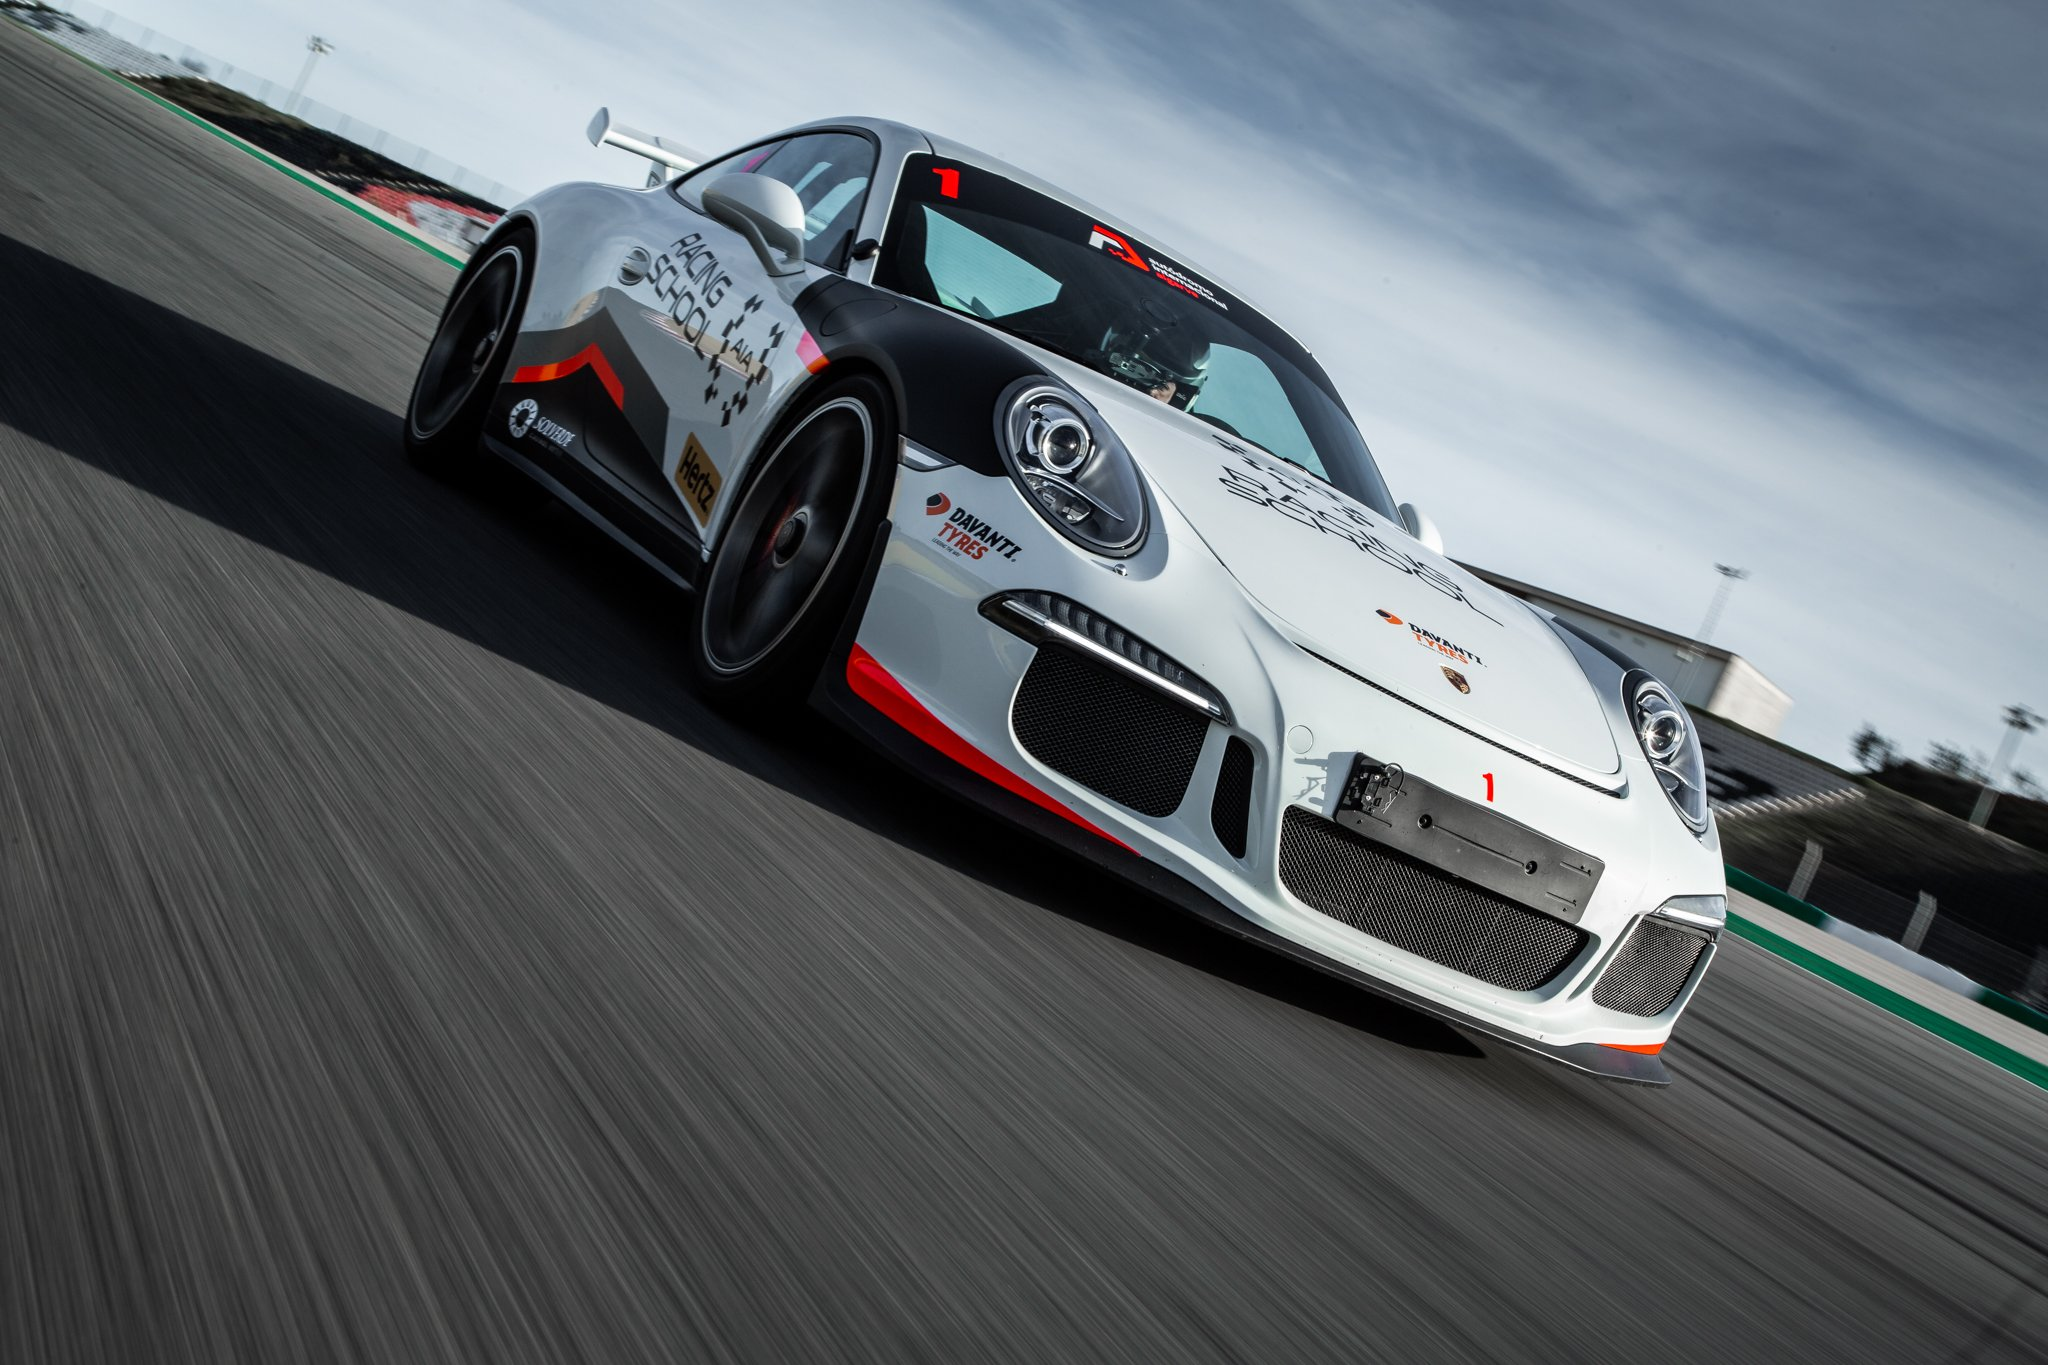 Algarve Motorsports